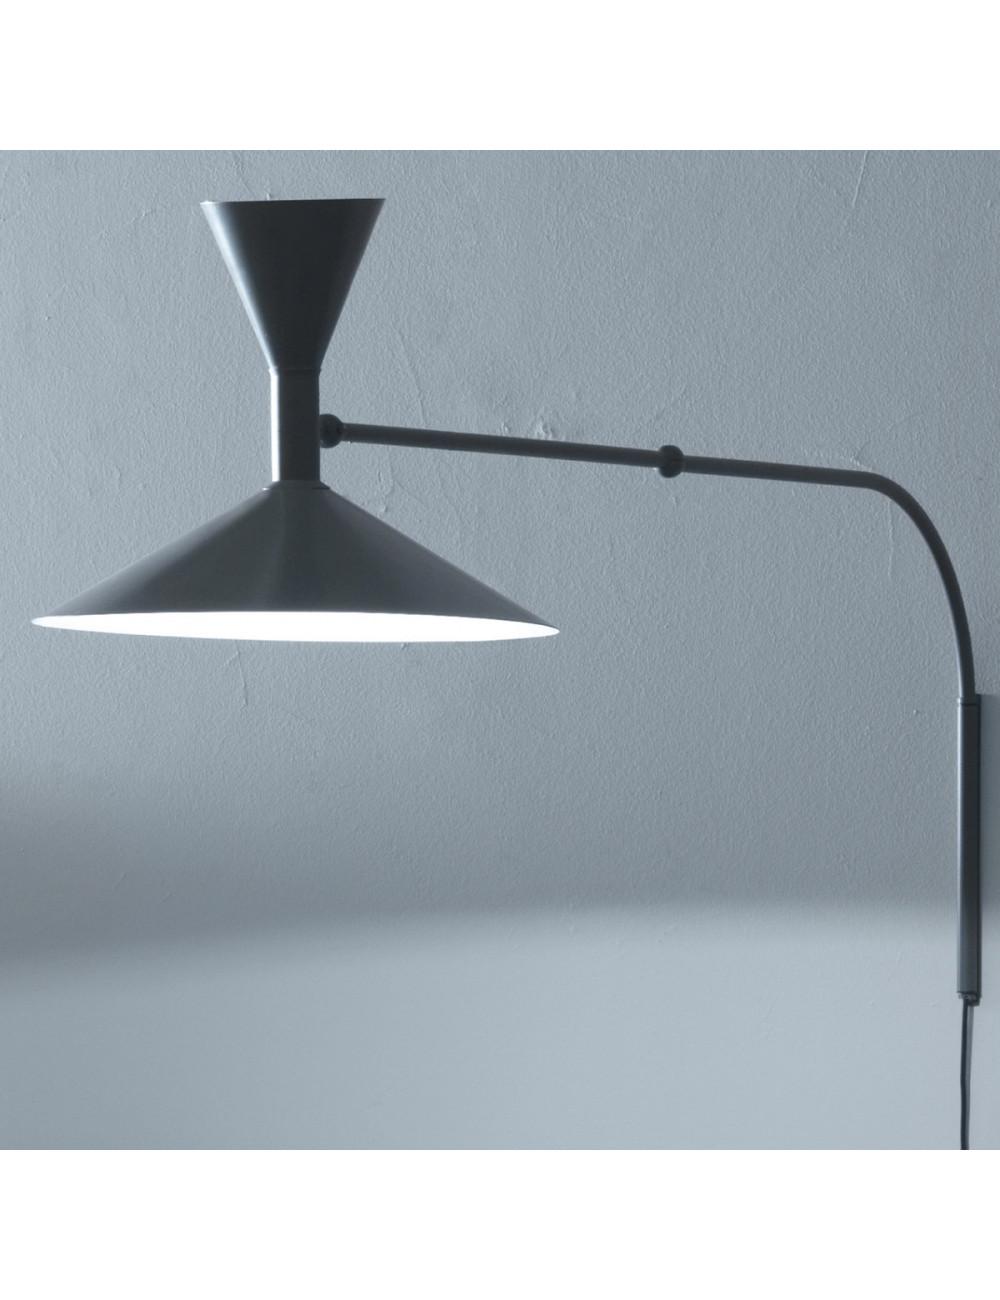 Lampe de marseille design le corbusier di nemo su eluce - Lampade a parete design ...